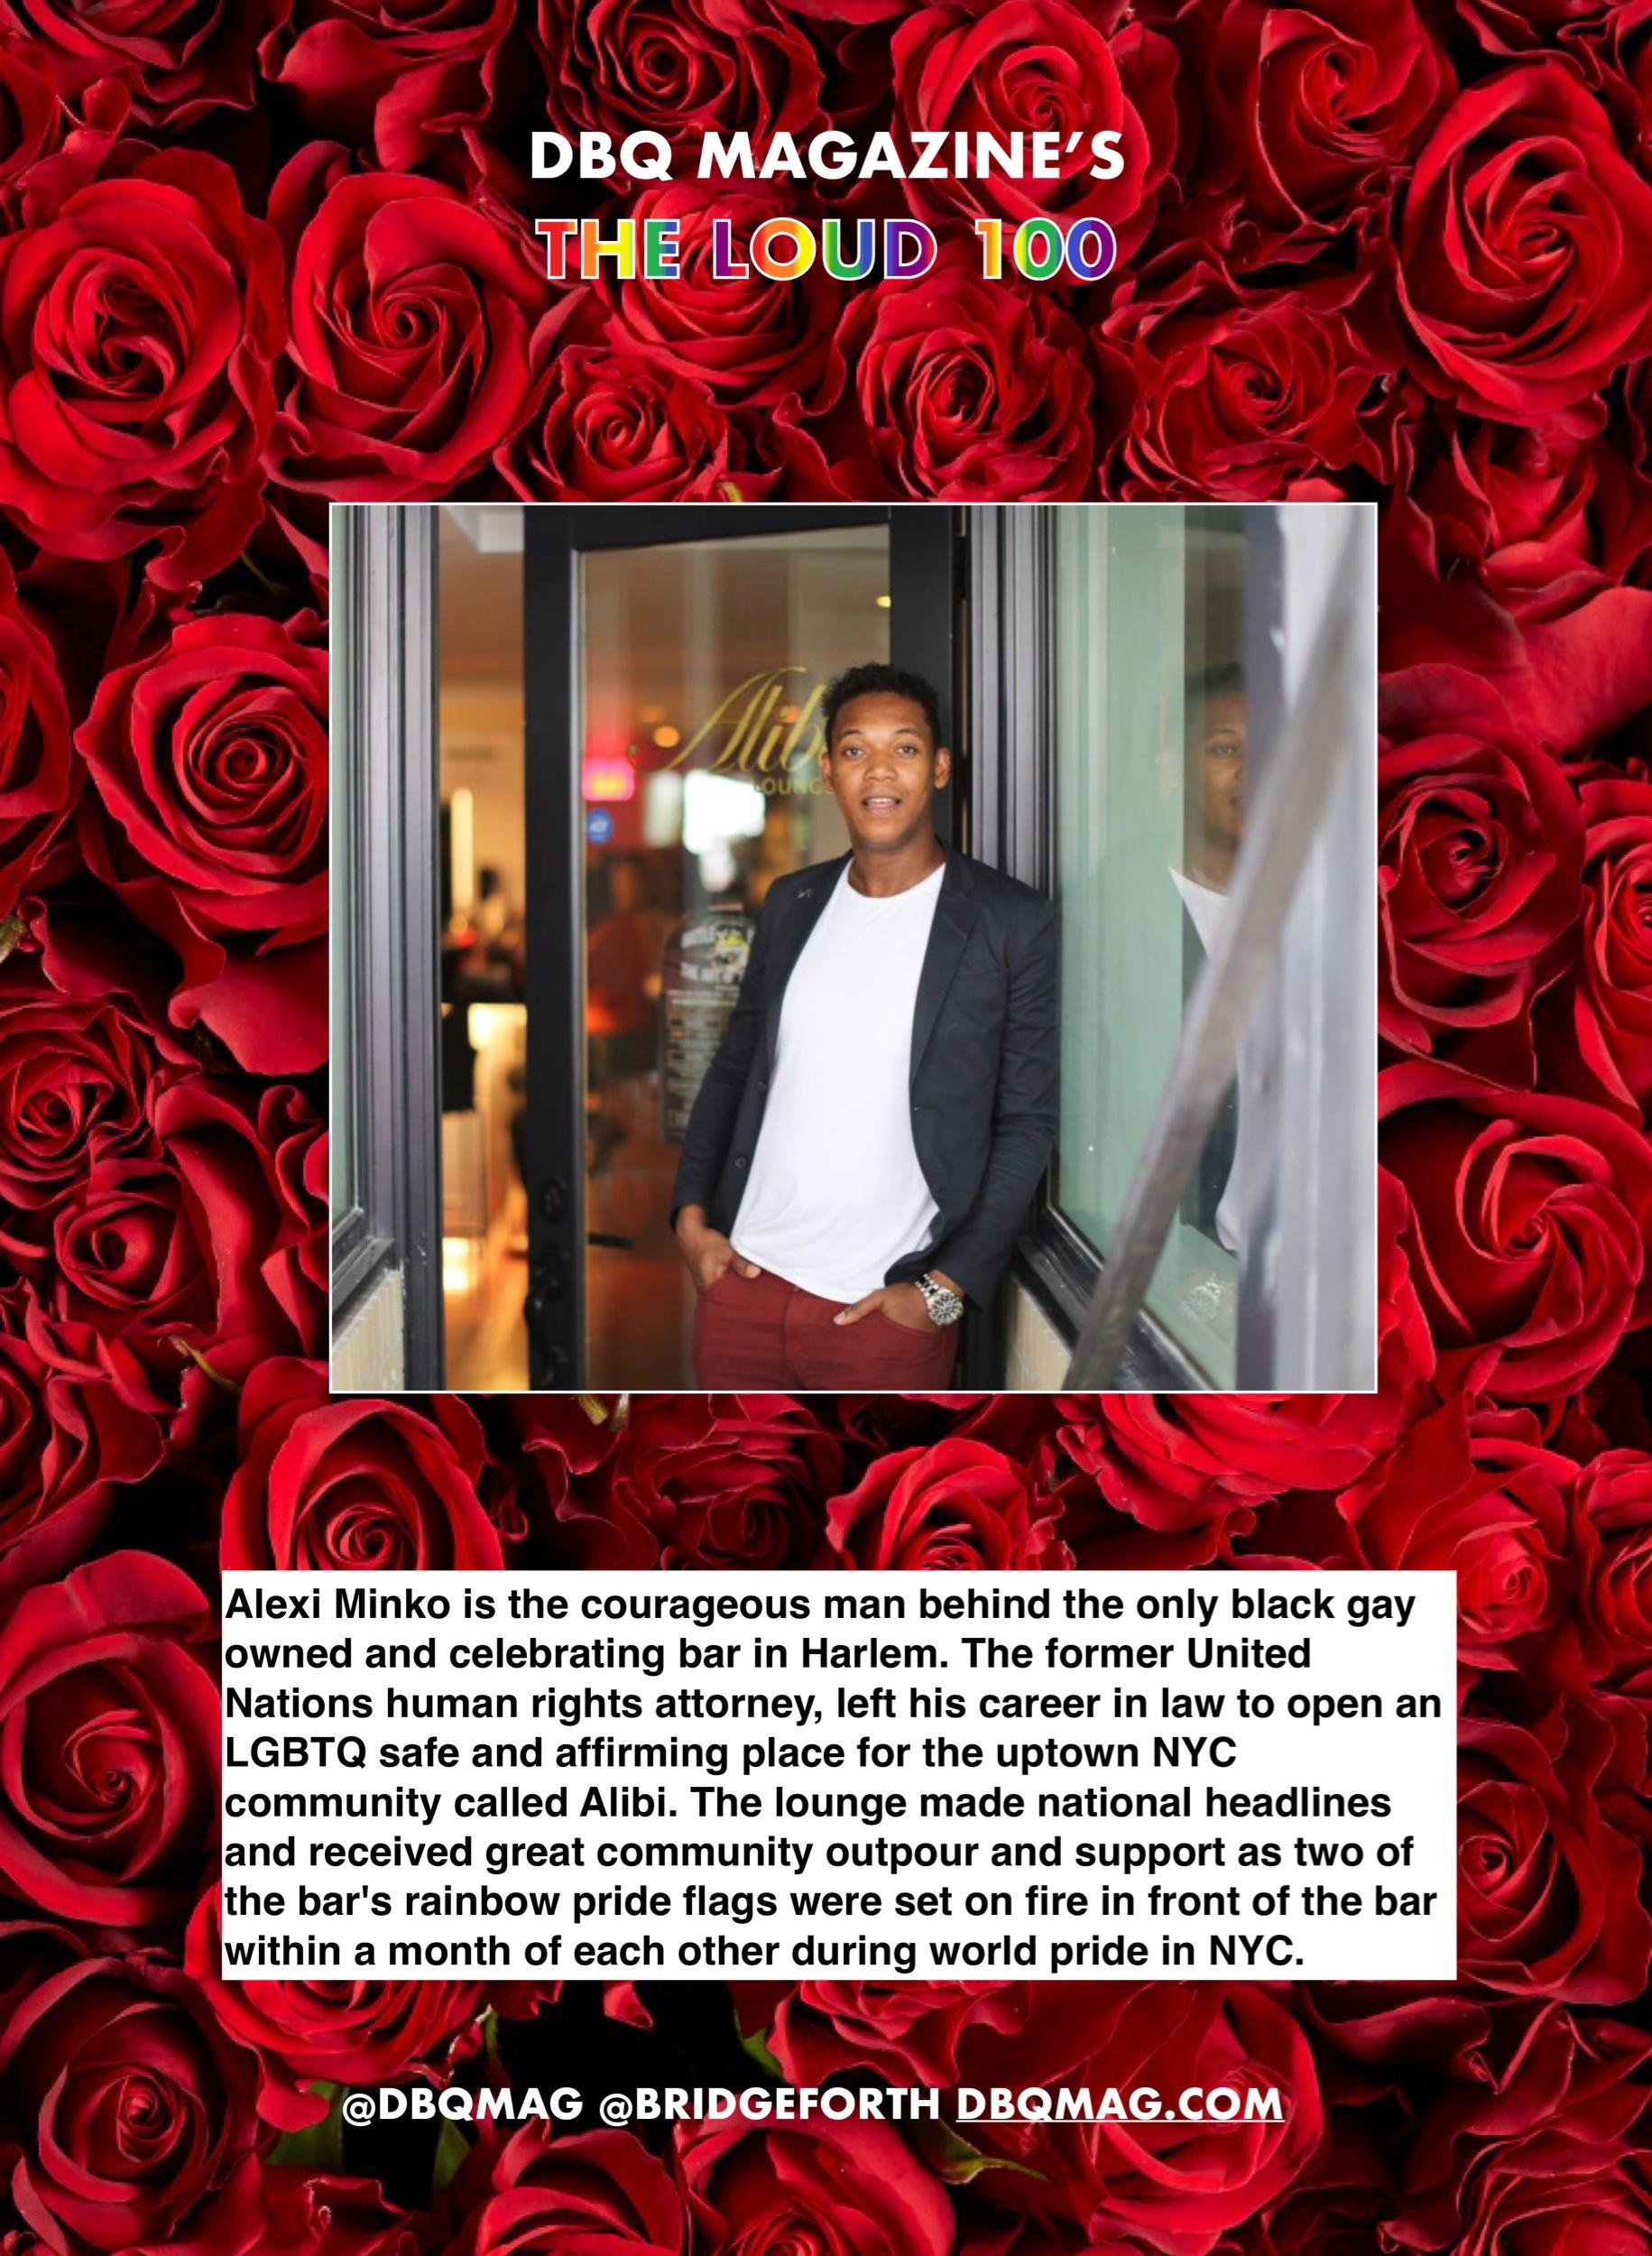 DBQ Magazine Summer 19 - LOUD 100-072.jpeg